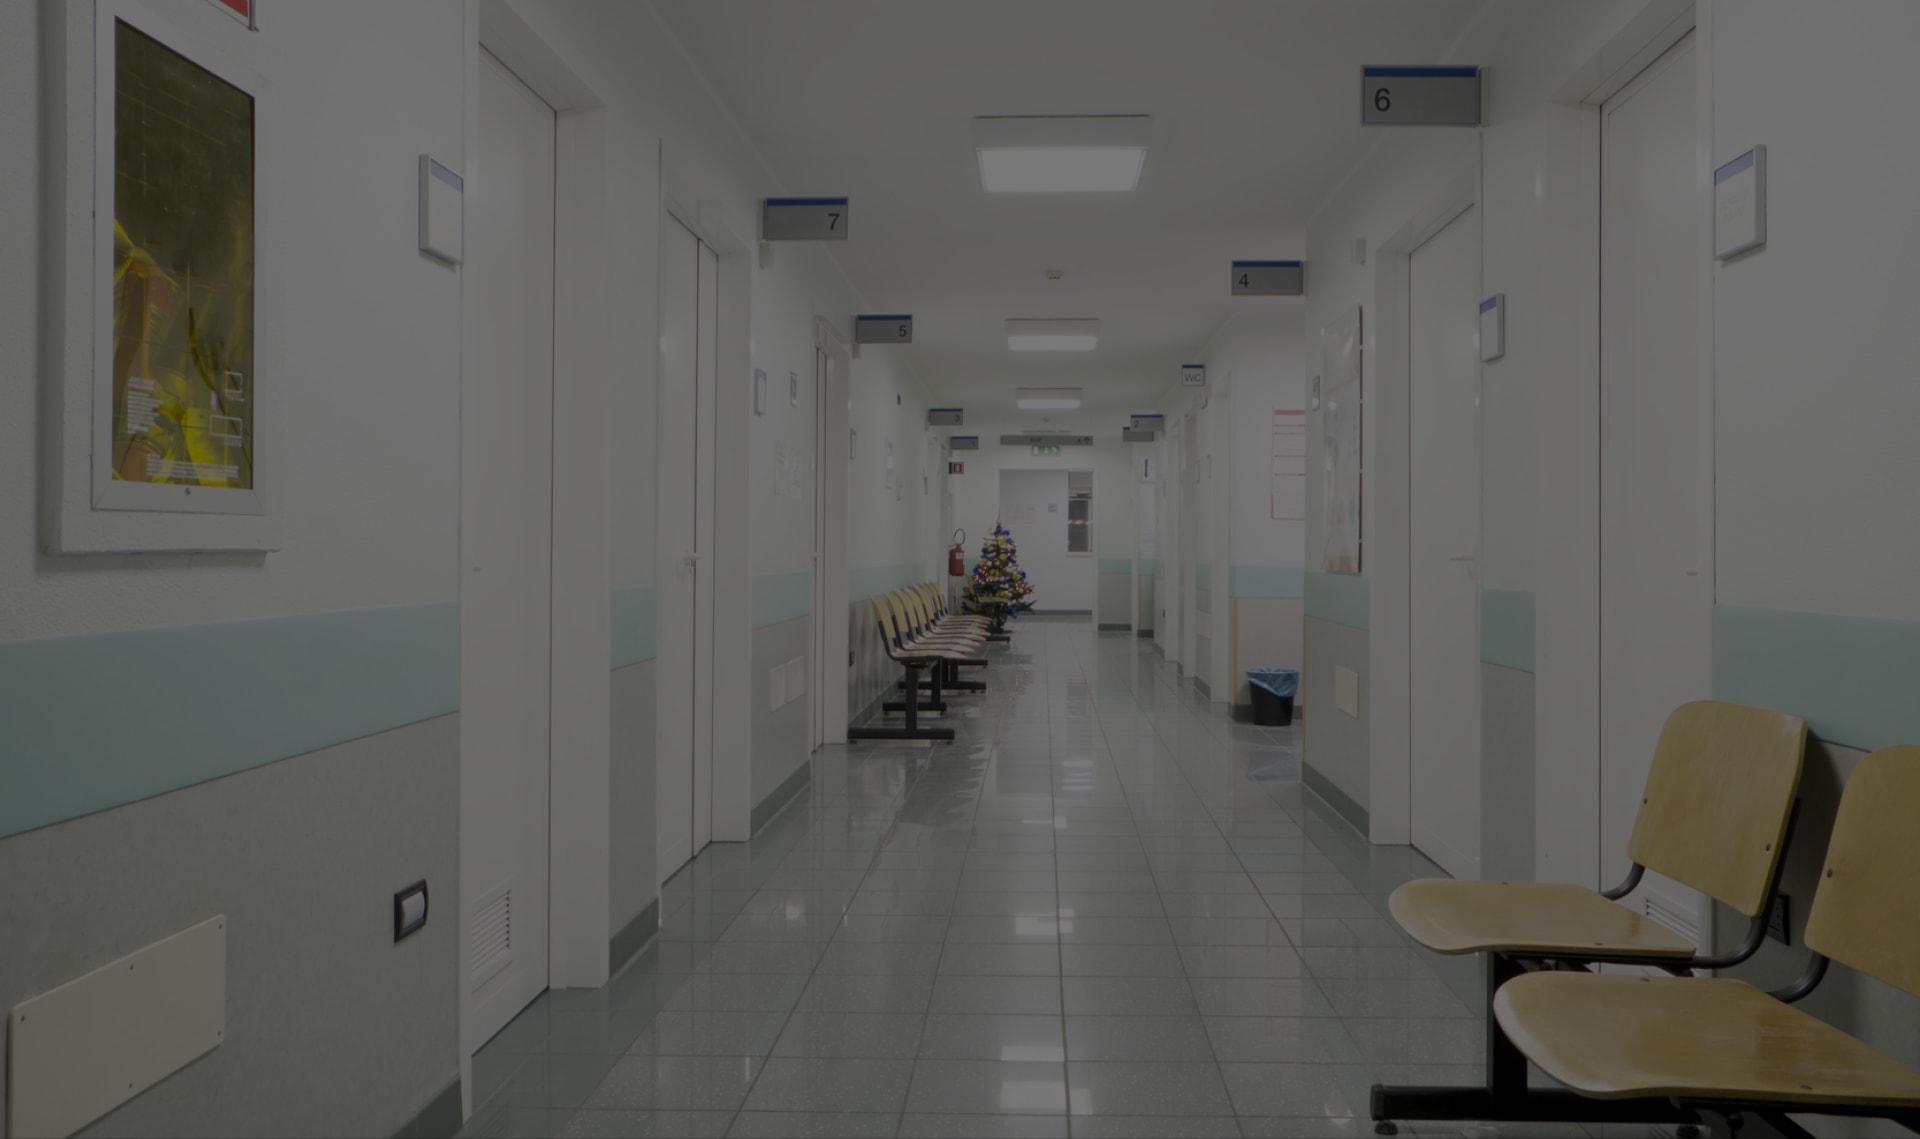 pulizia clinica milano emmeemme